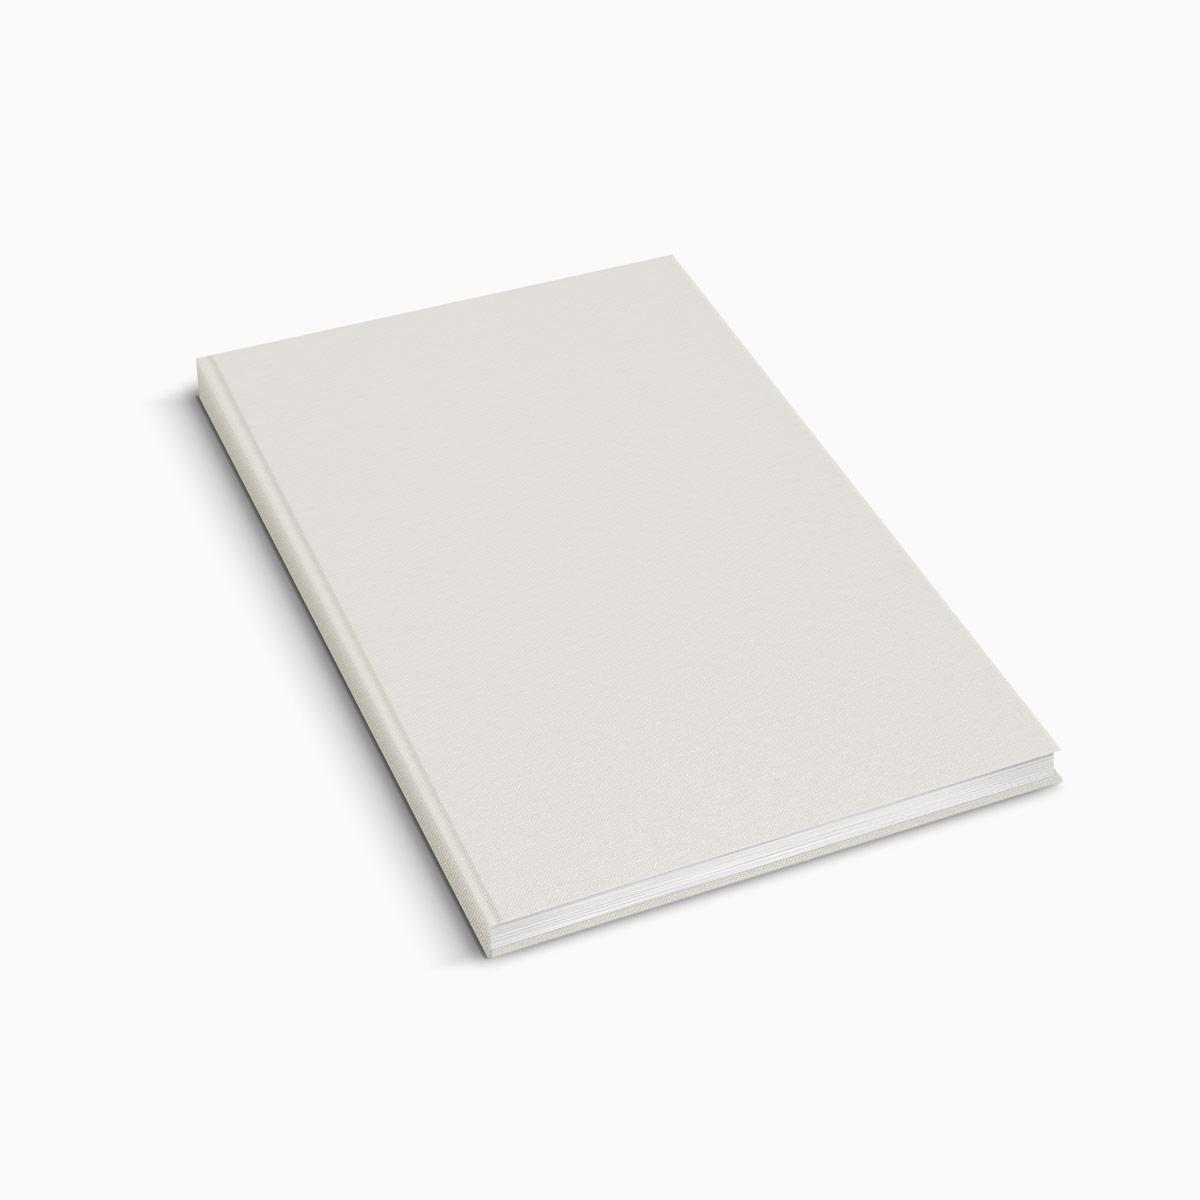 Hardcover Premium - Weiss